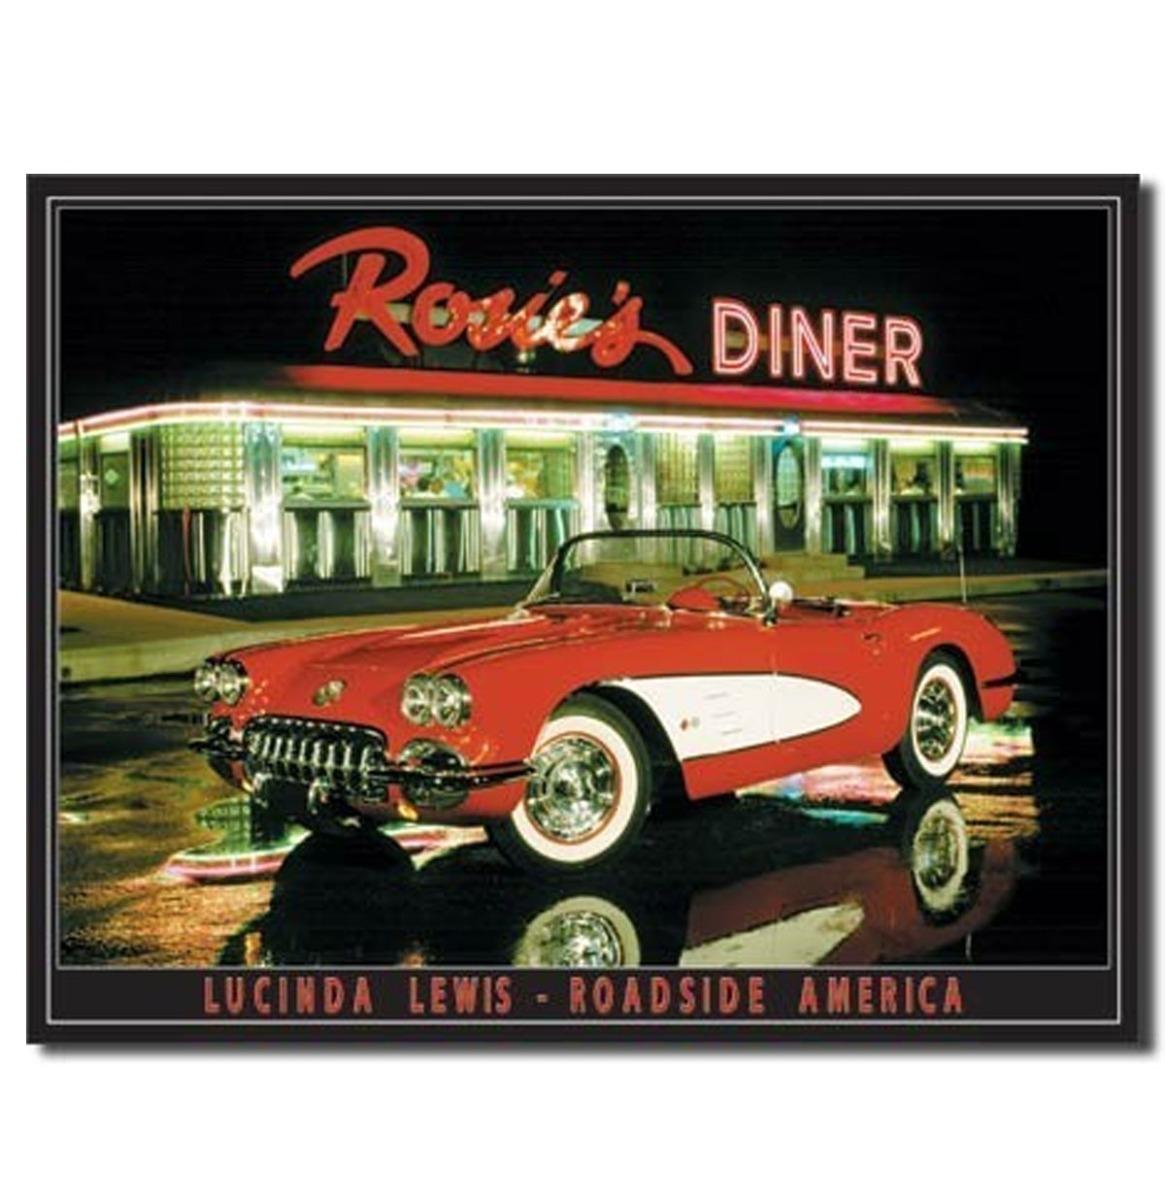 Rosie's Diner Metalen Bord - 8 x 11 cm